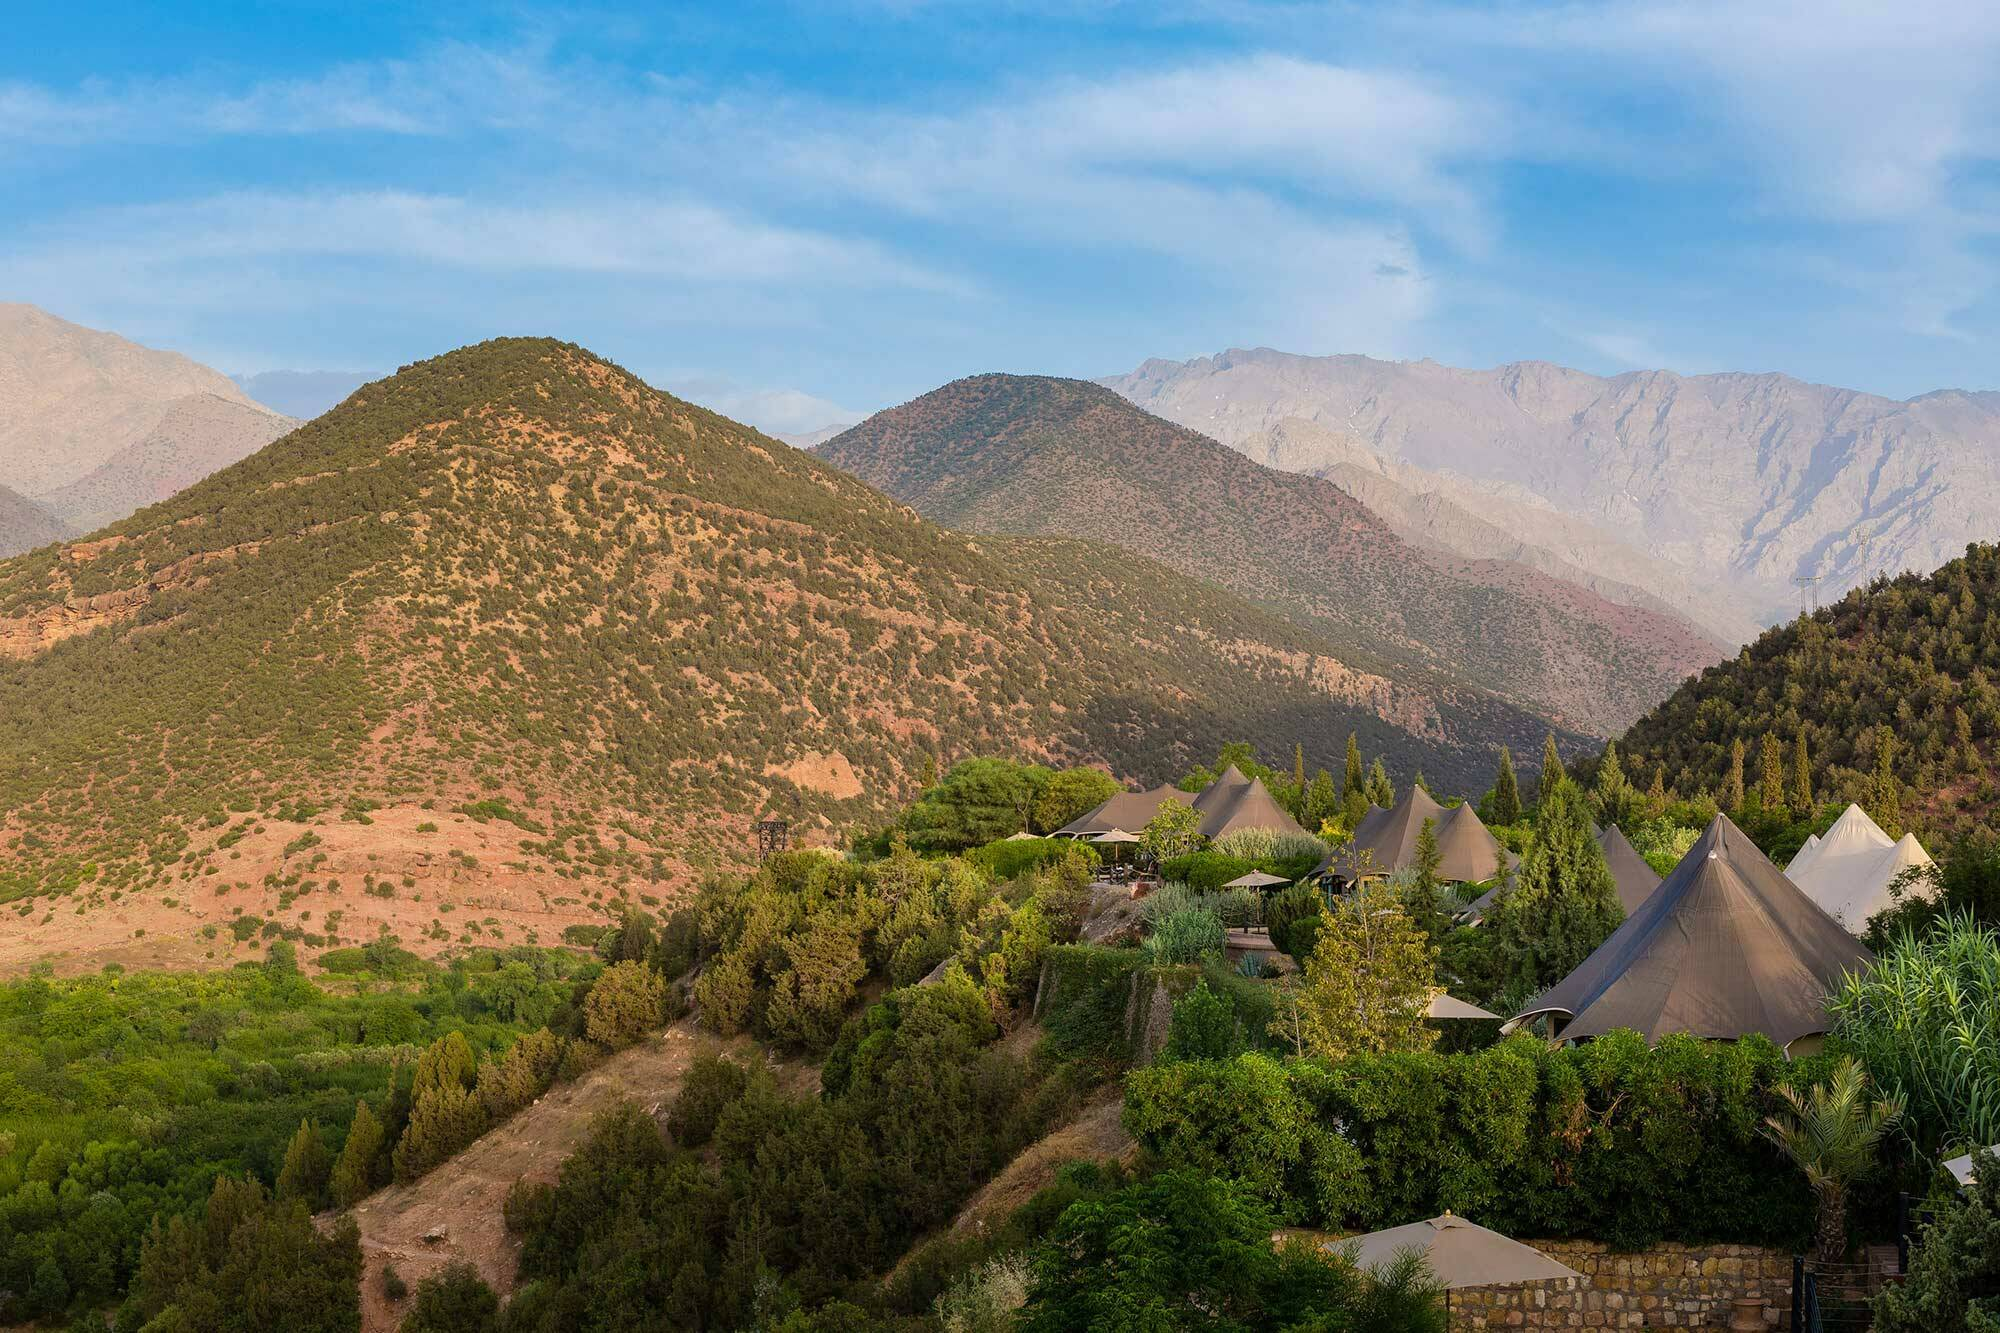 Kasbah Tamadot Maroc Virgin Berber Tente Exterieur